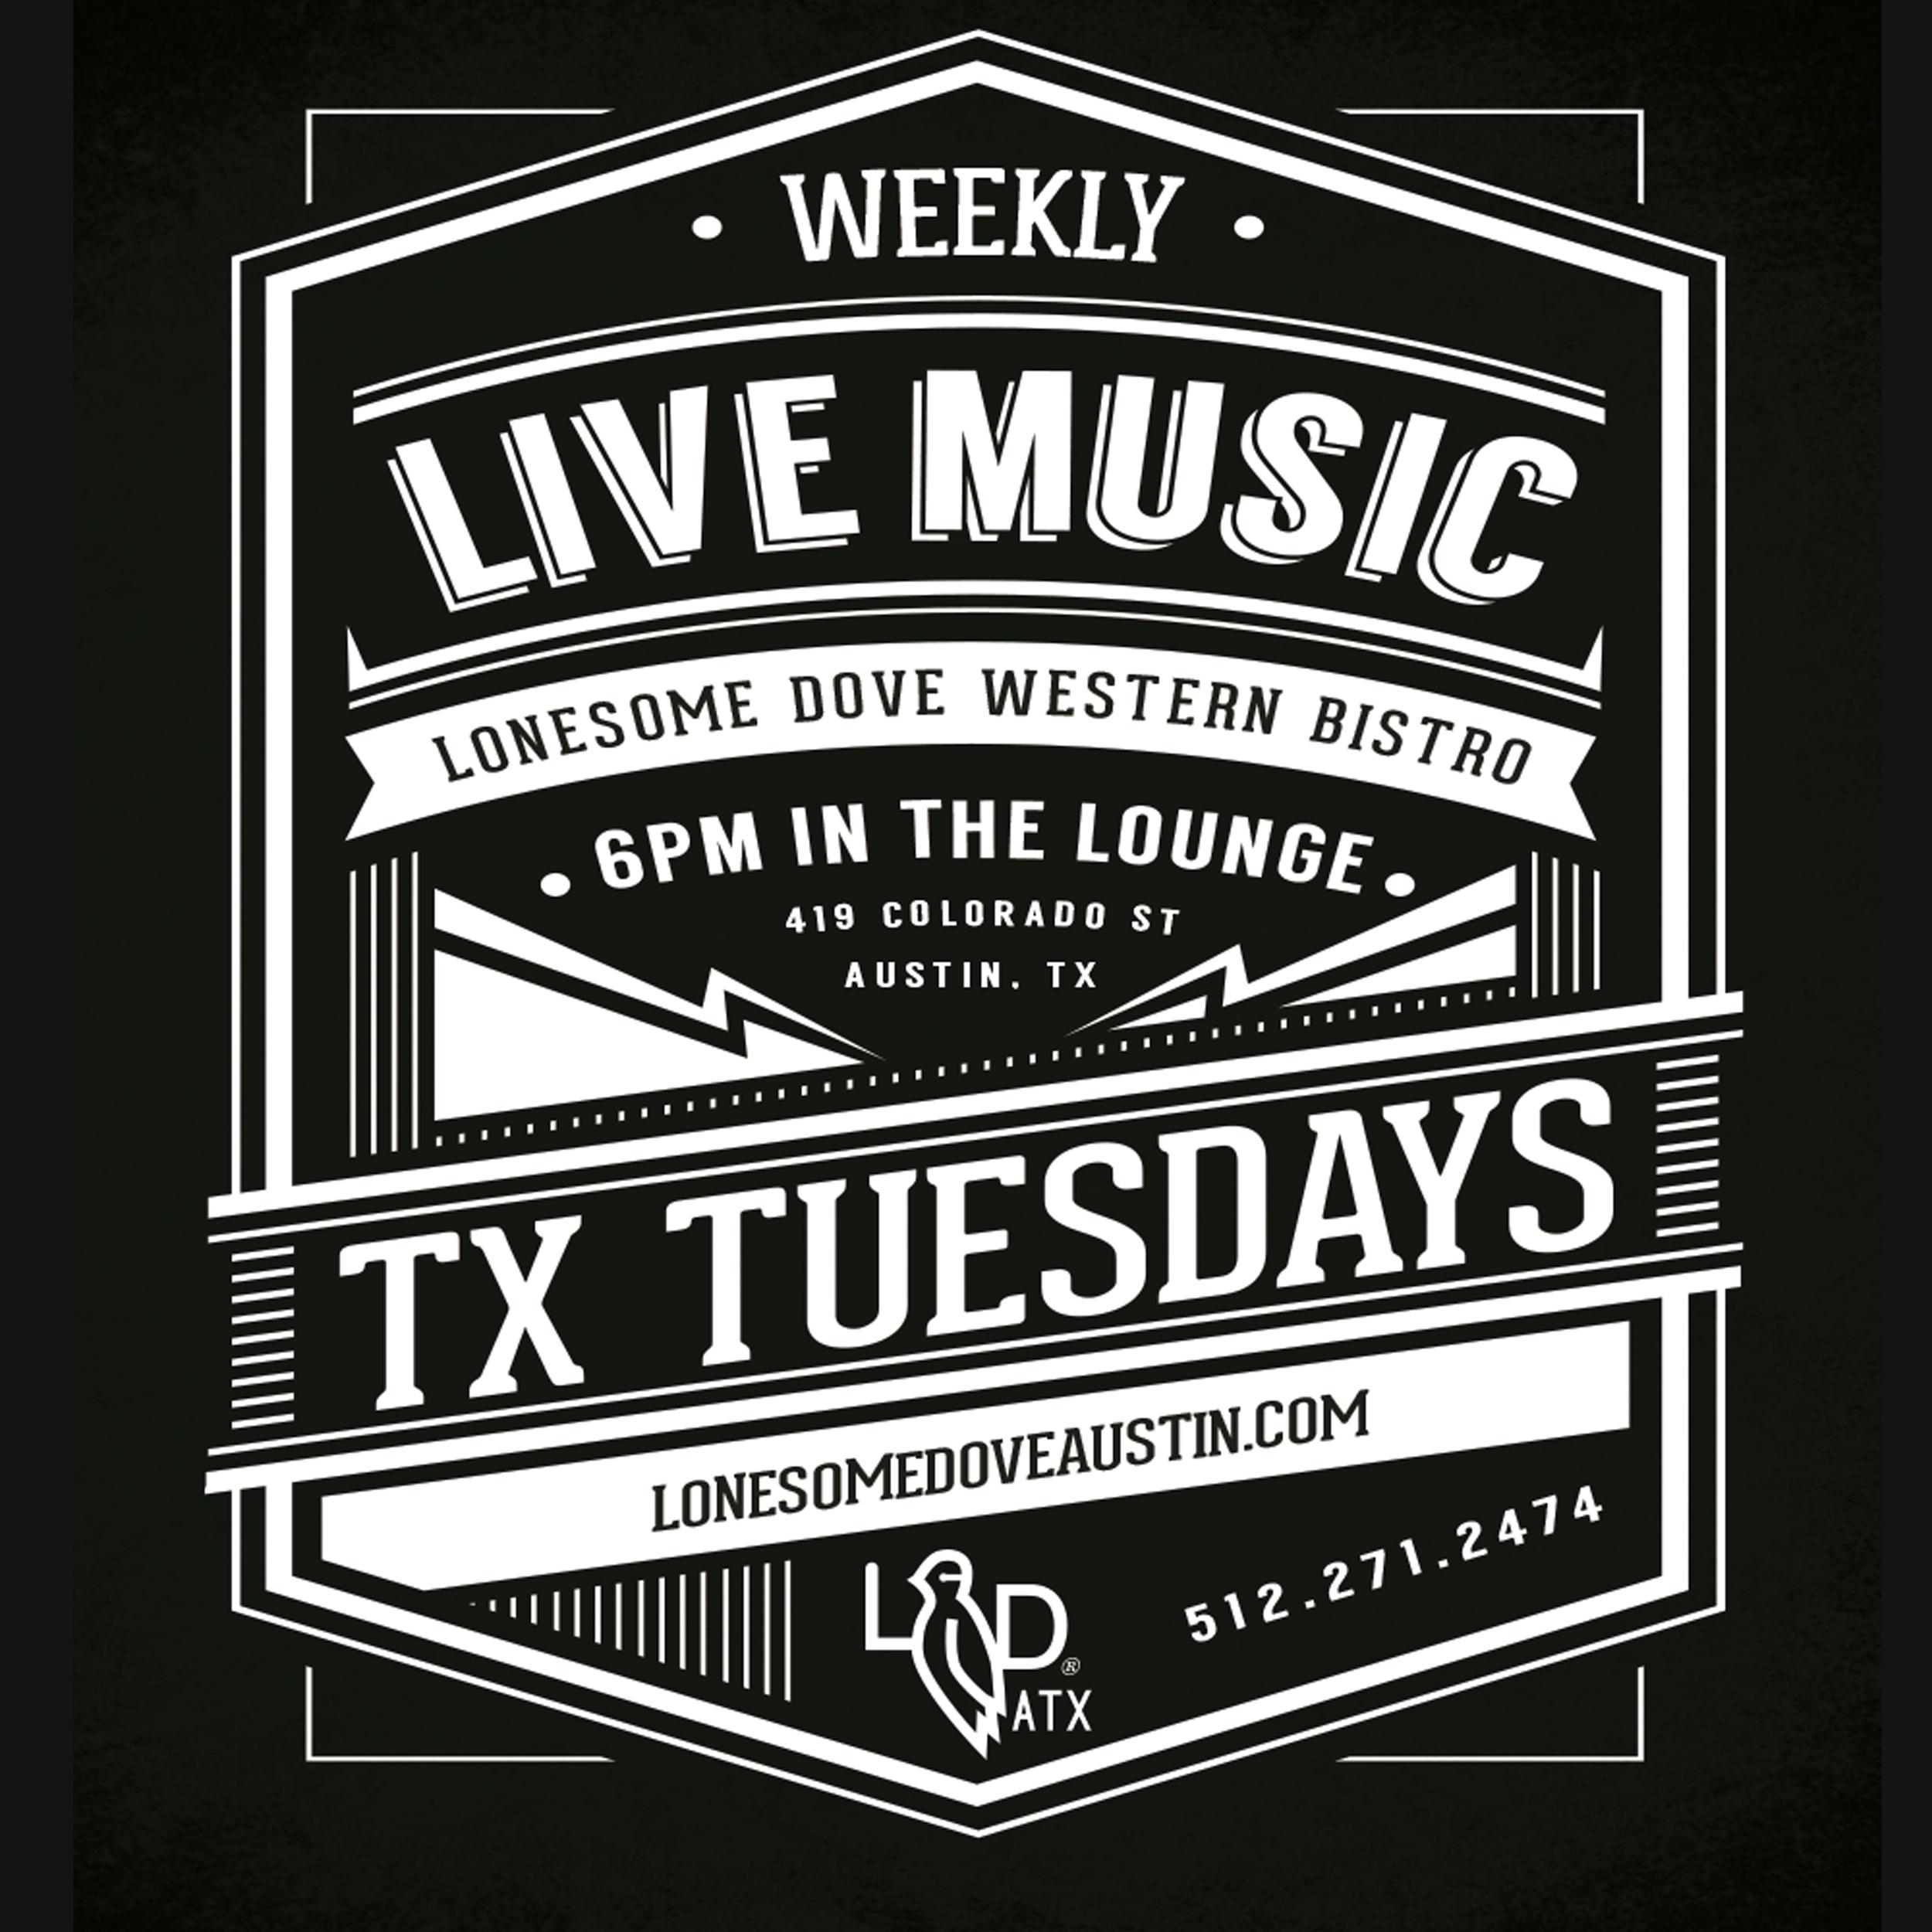 Texas-Tuesdays-SOCIAL-weekly